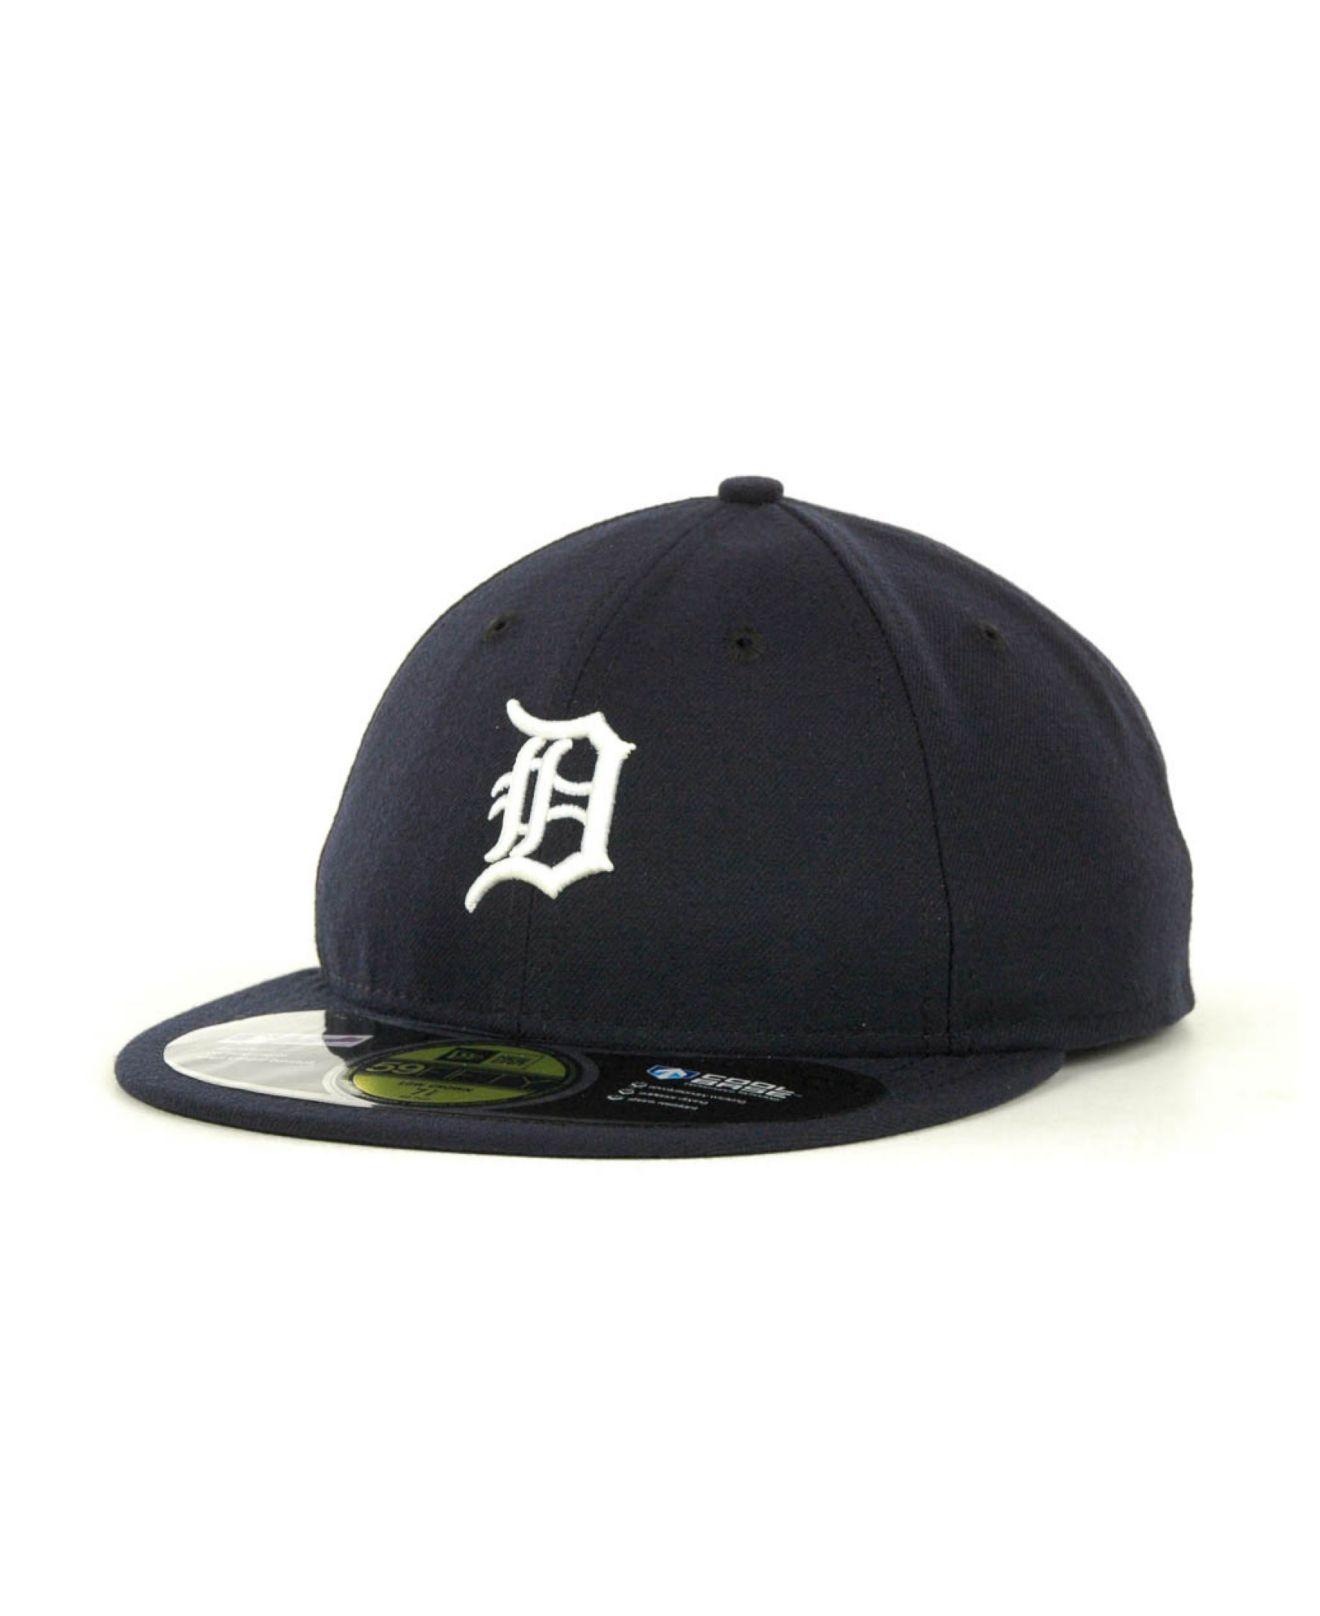 best website 52b9b cf7d6 ... home navy low crown authentic hat. noimagefound. previous. 1. 2. 3  84ad9 c9cfa  cheap lyst ktz detroit tigers low crown ac performance 59fifty  cap in ...